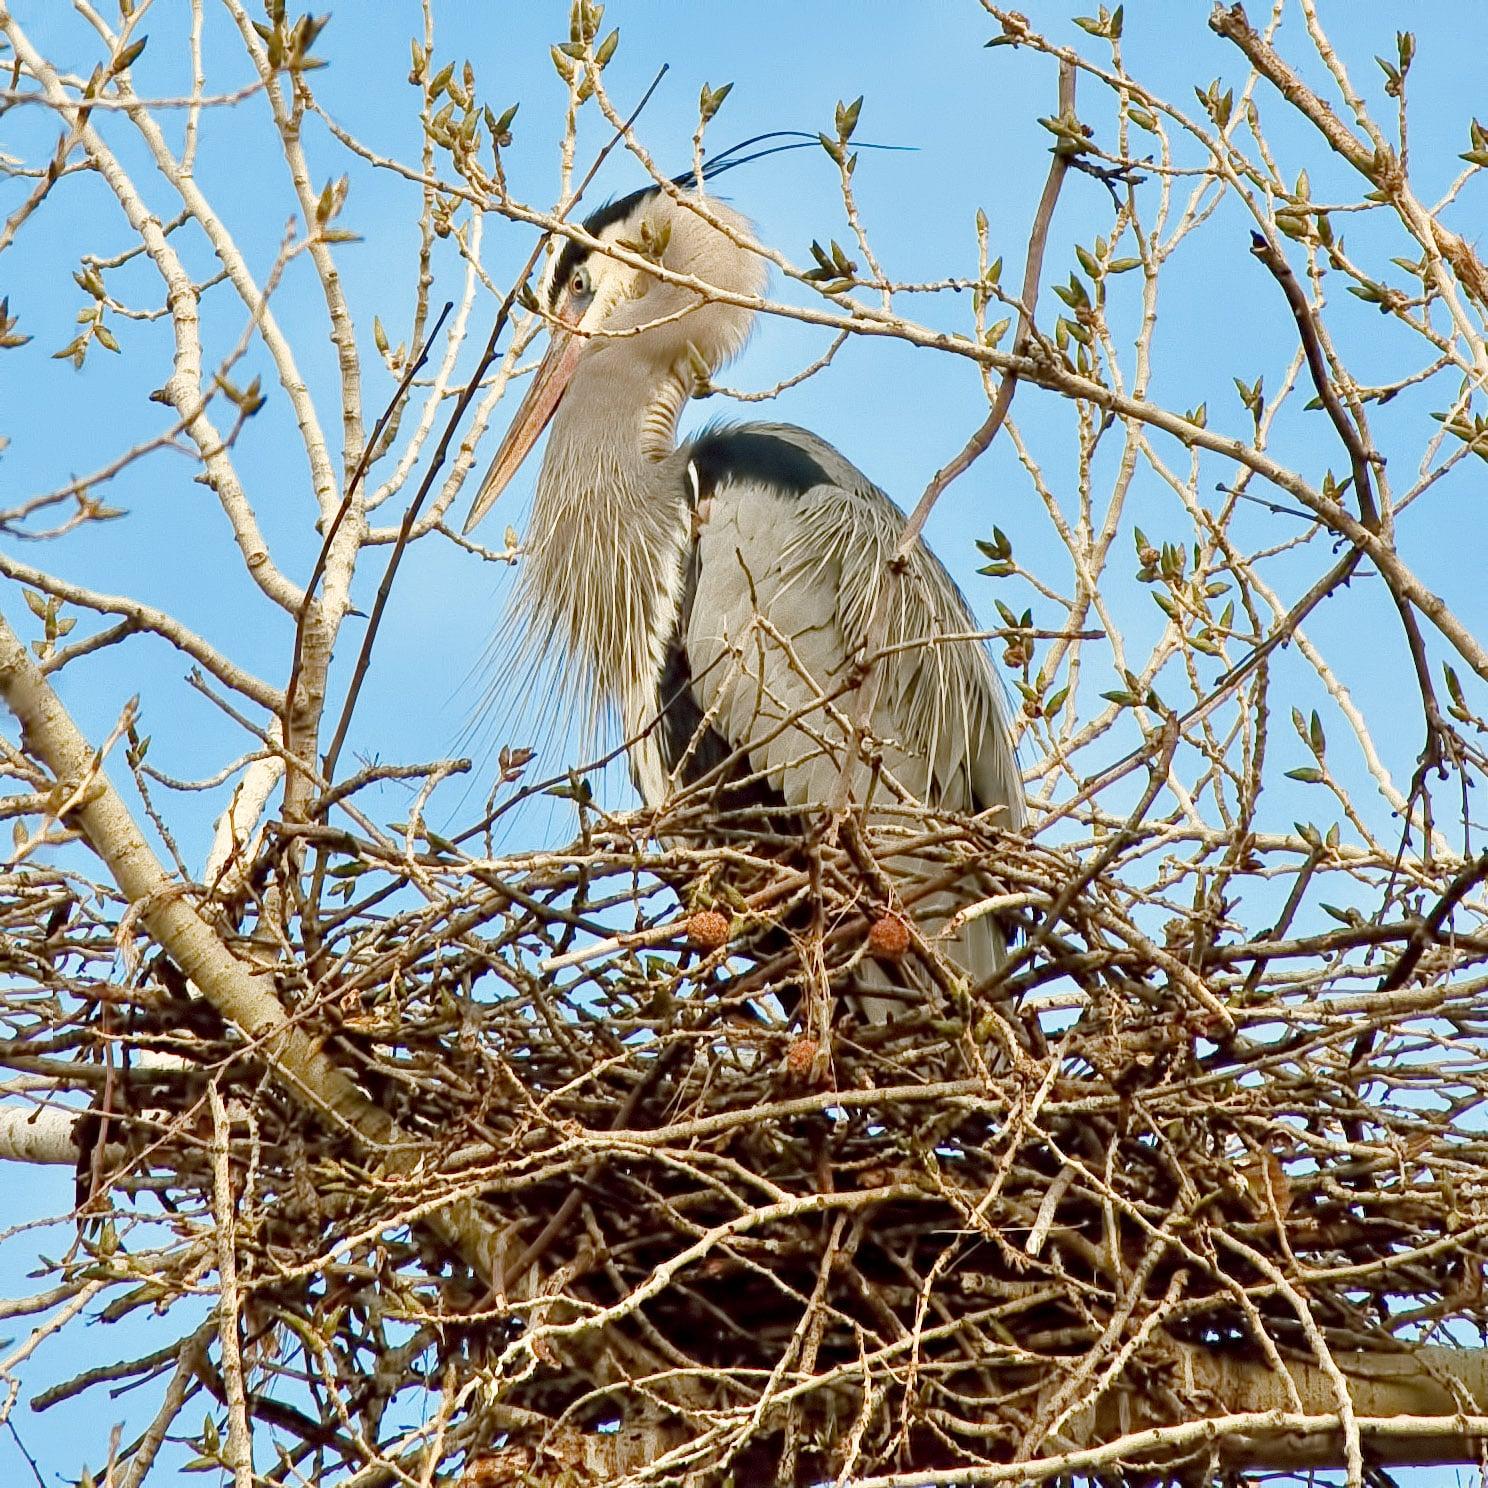 Blue Heron nesting in the Rancho Sedona RV Park in Sedona, Arizona.